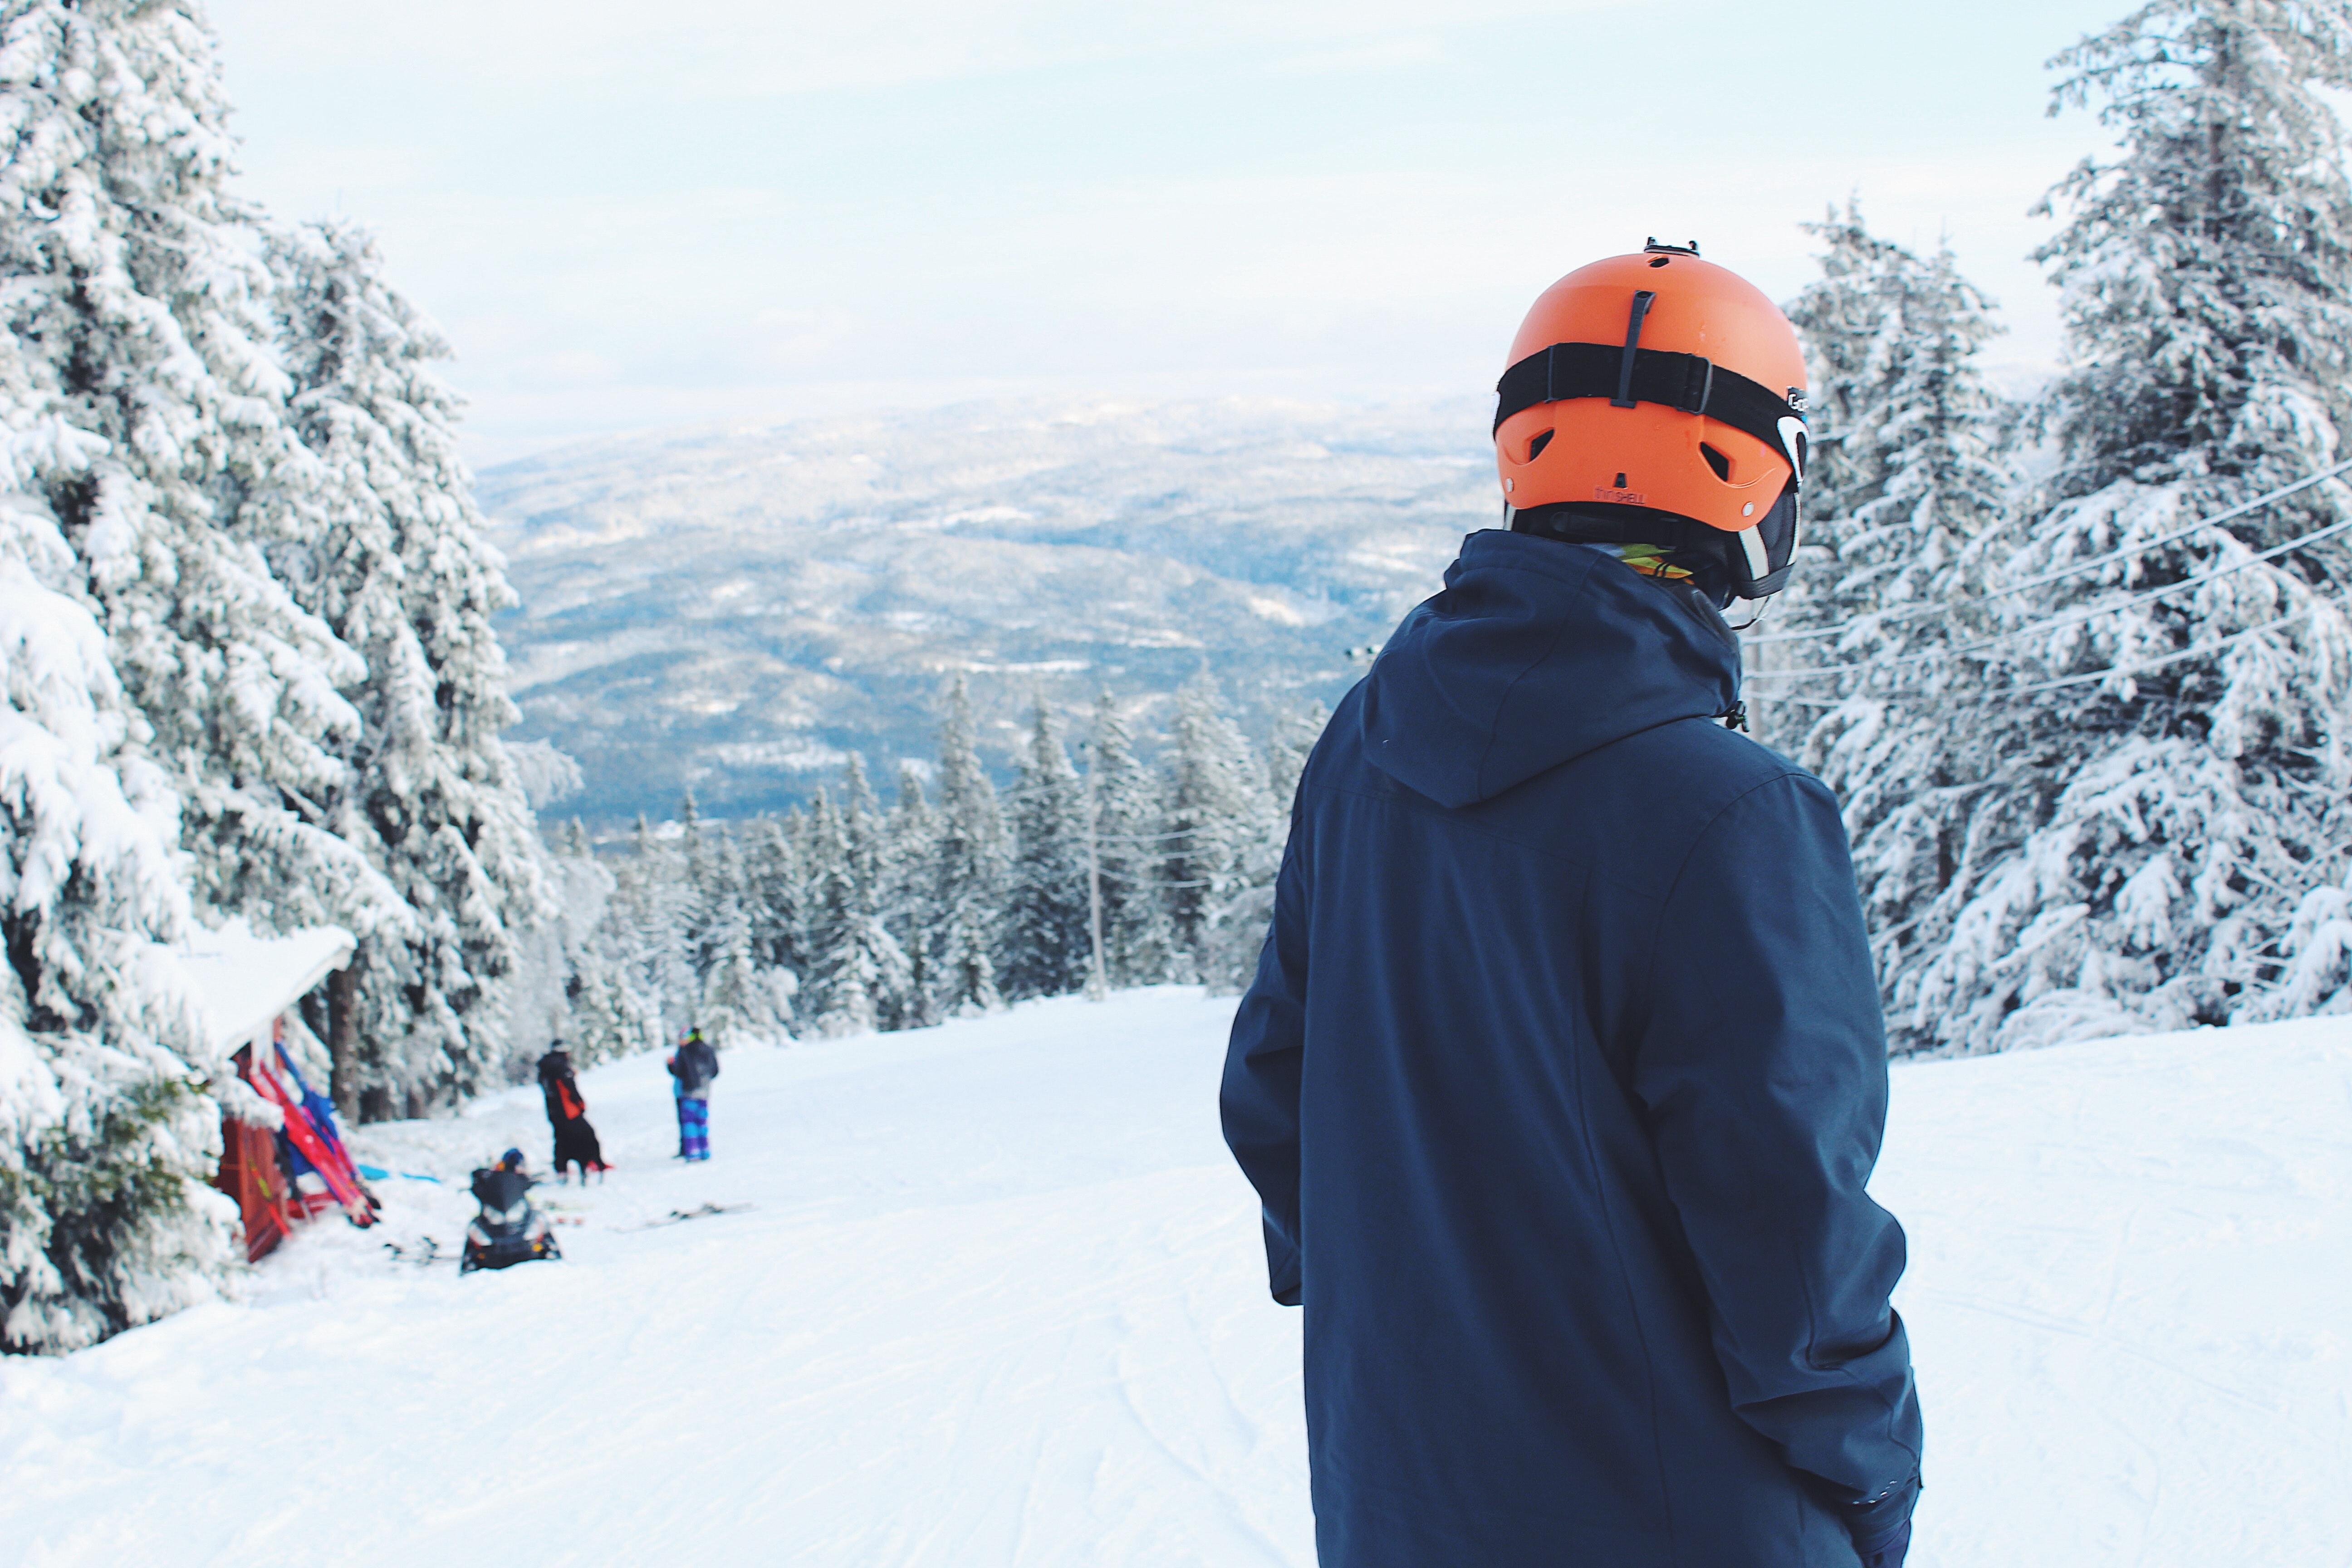 47af7f562ca ... tillflykt, skidort, skidbacke, skidåkare, backe, snö, snowboardåkare,  åka snowboard, snöig, sport, träd, väder, vinter-, vinterkläder, trä  5184x3456